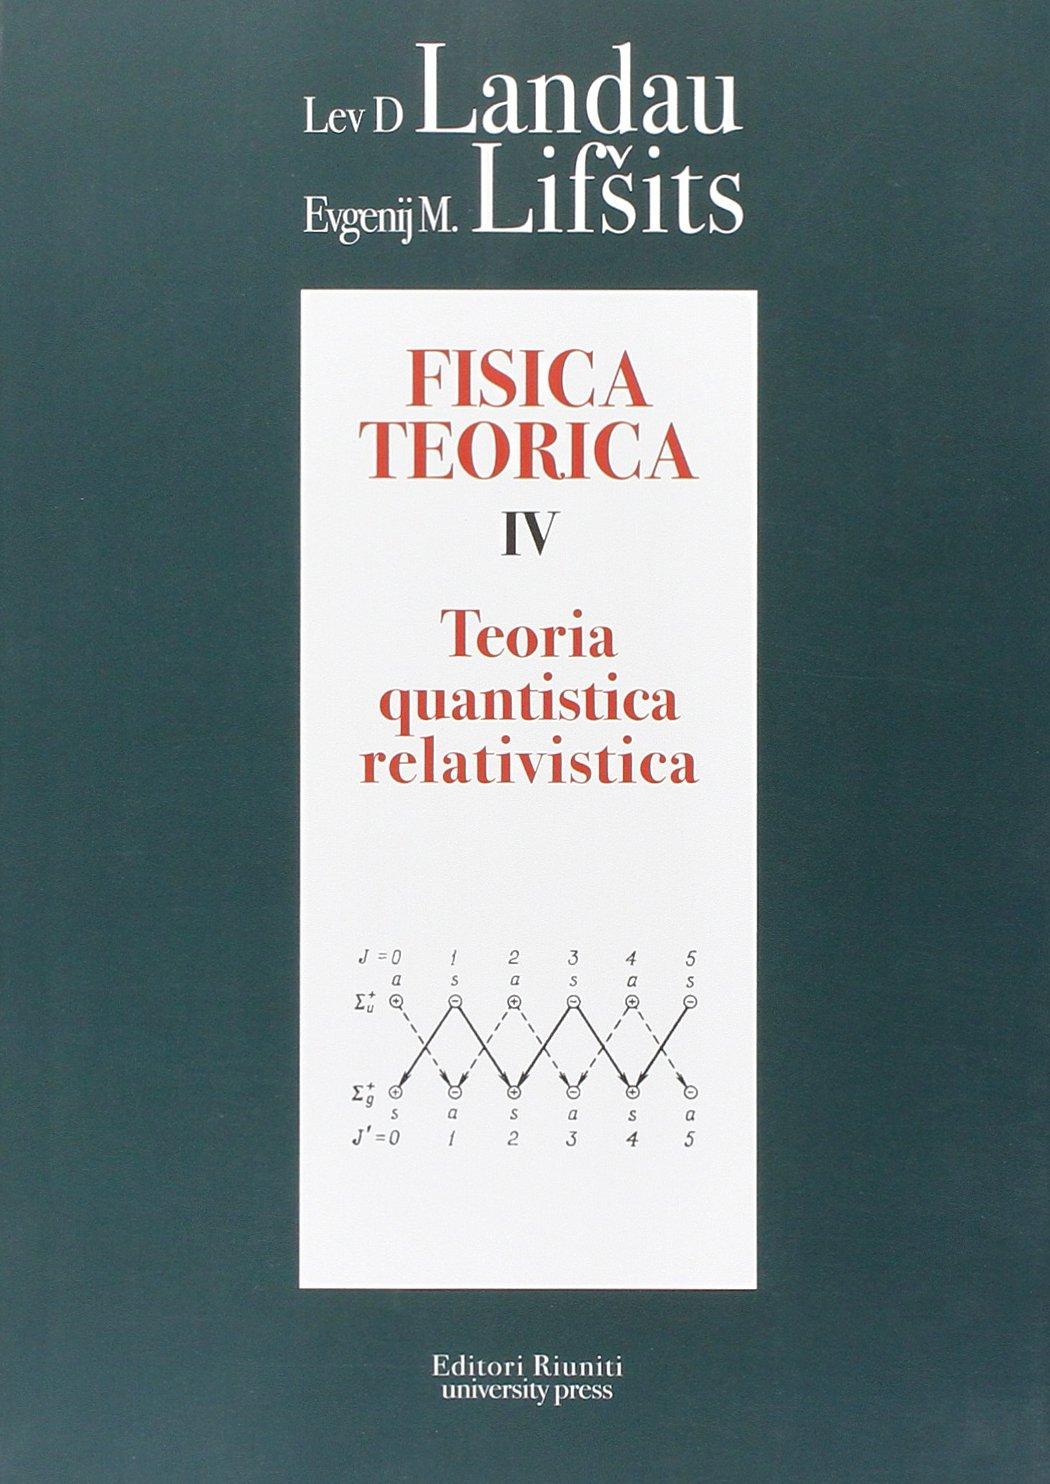 Fisica teorica vol. 4 - Teoria quantistica relativistica pdf